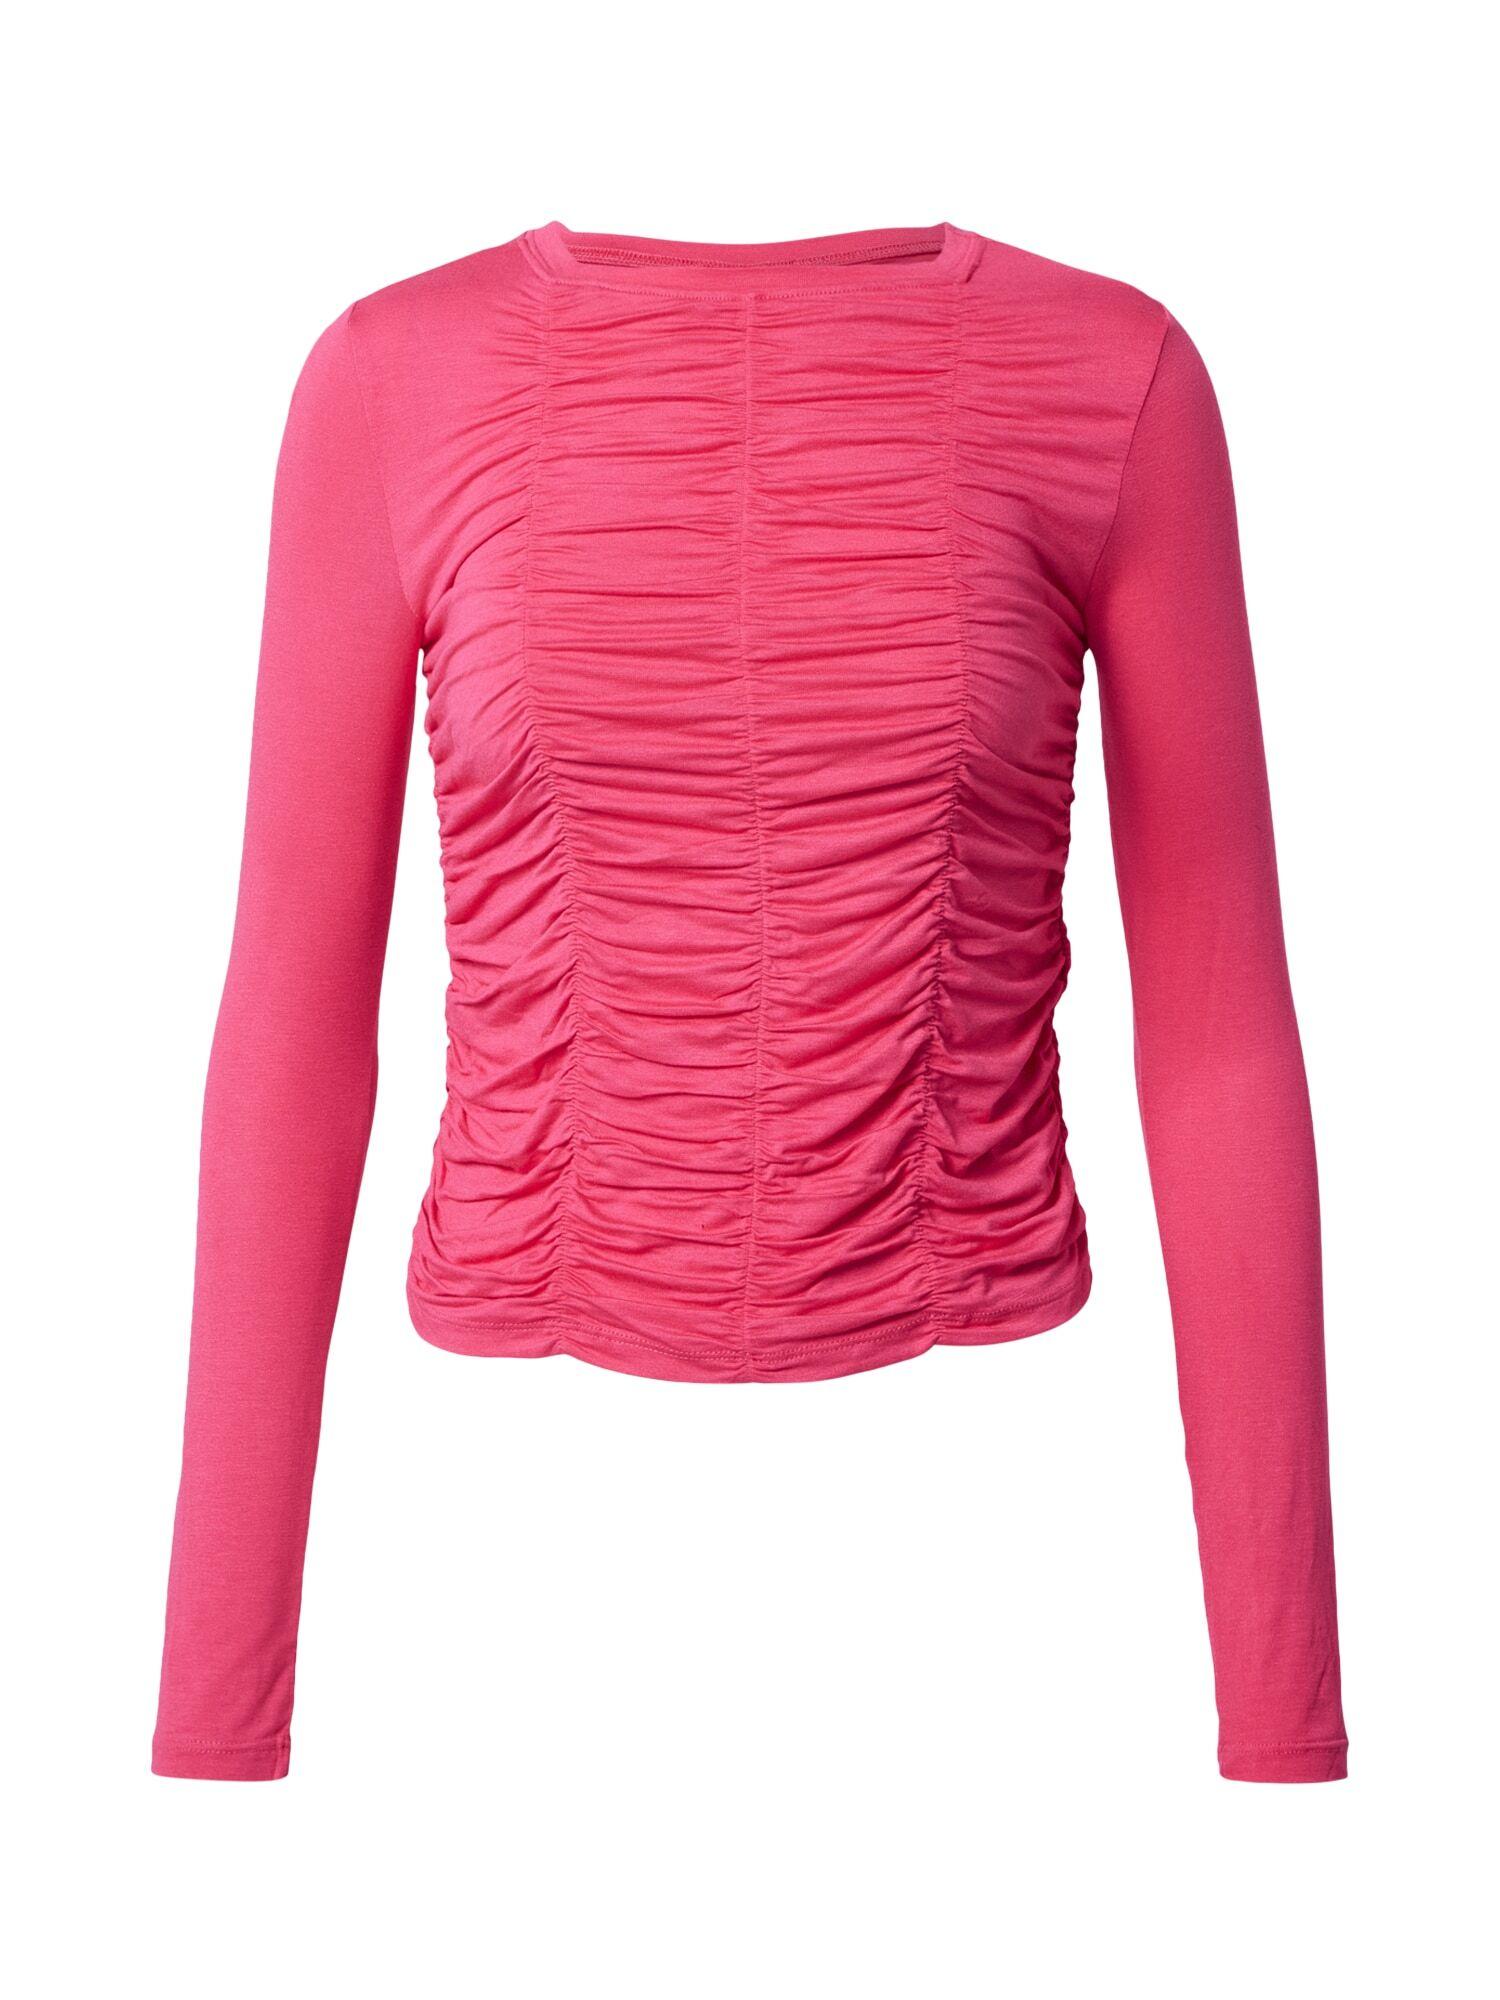 Gina Tricot Haut 'Catti'  - Rose - Taille: XL - female